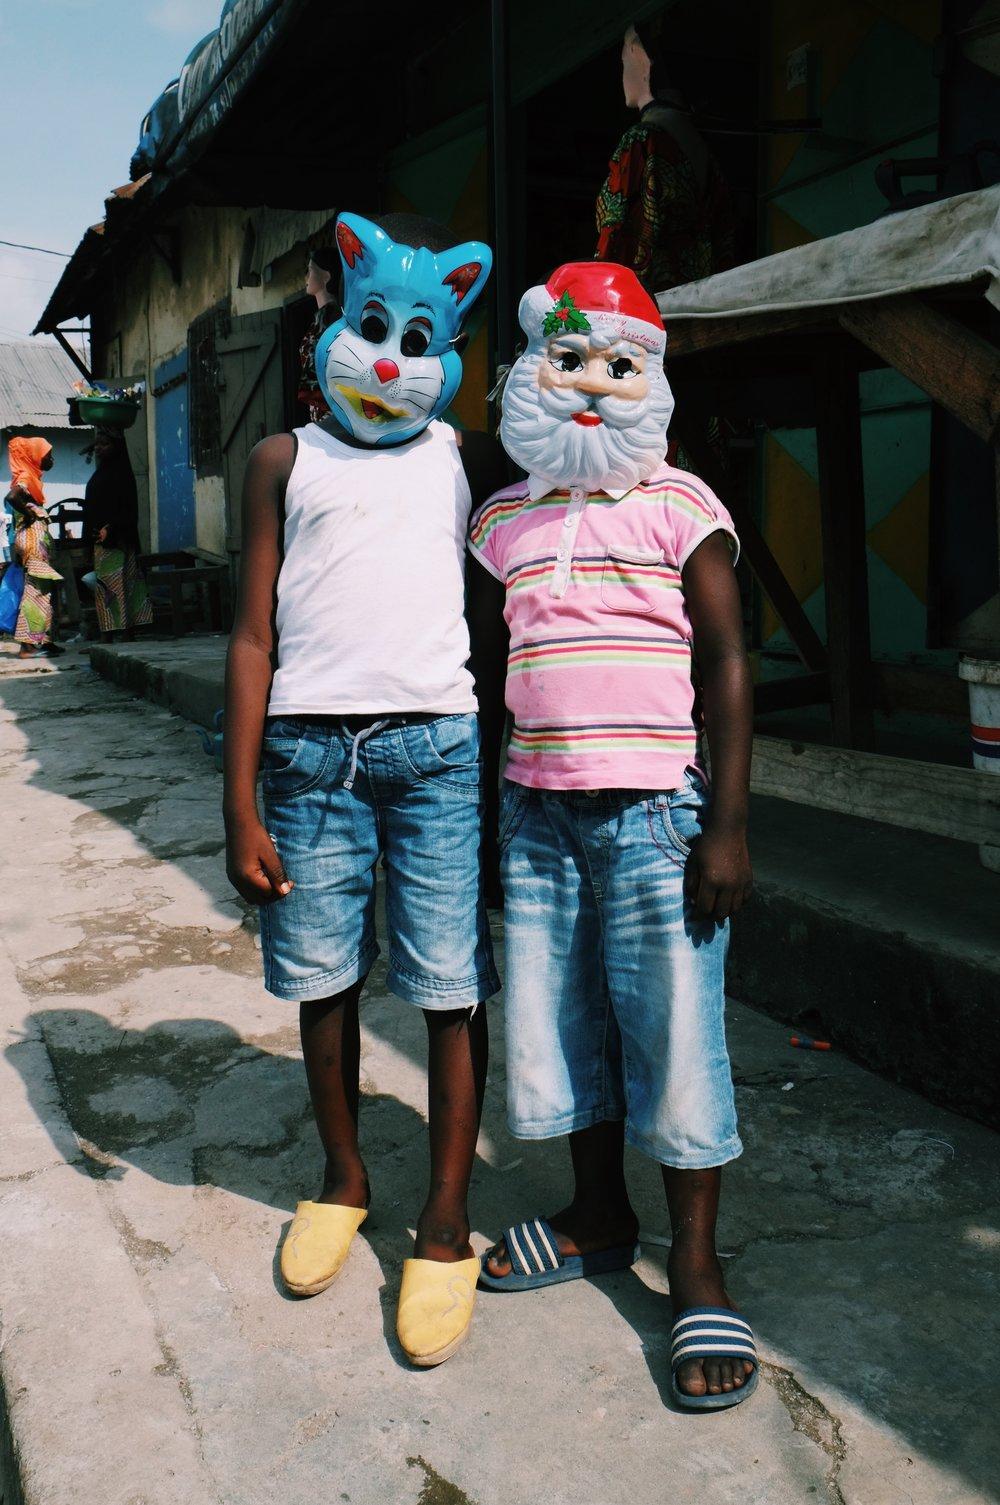 Treichville Market Abidjan kids Ivory Coast Joost Bastmeijer.jpeg